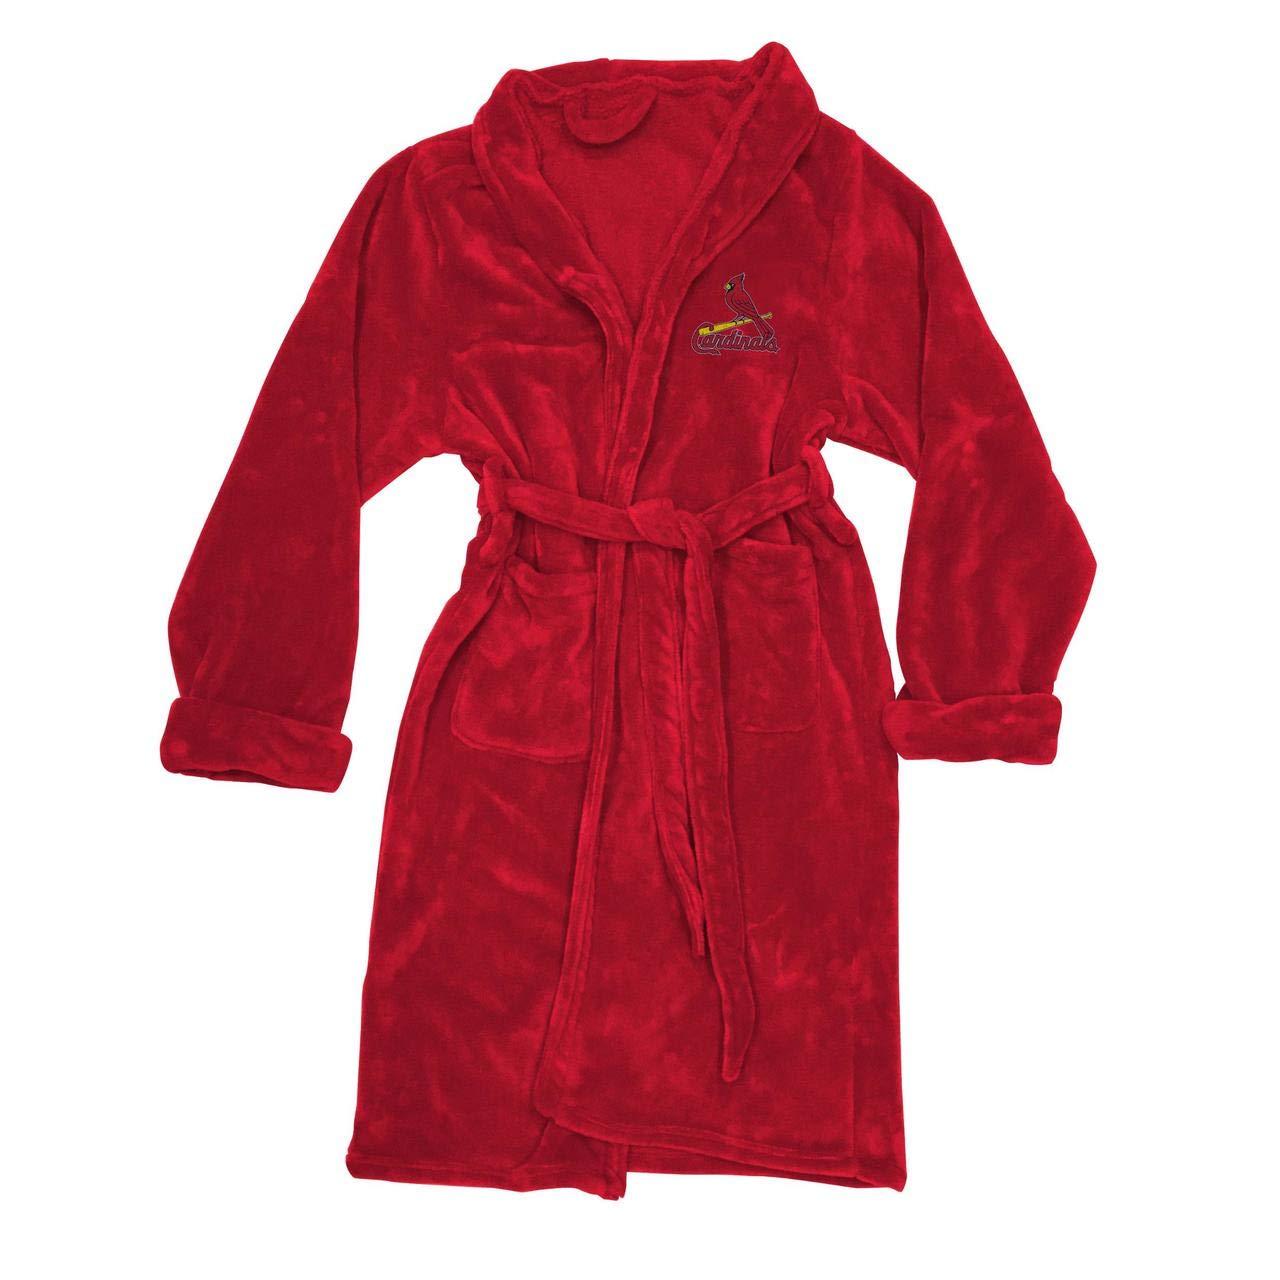 The Northwest Company MLB Unisex-Adult Mens L//XL Silk Touch Bath Robe